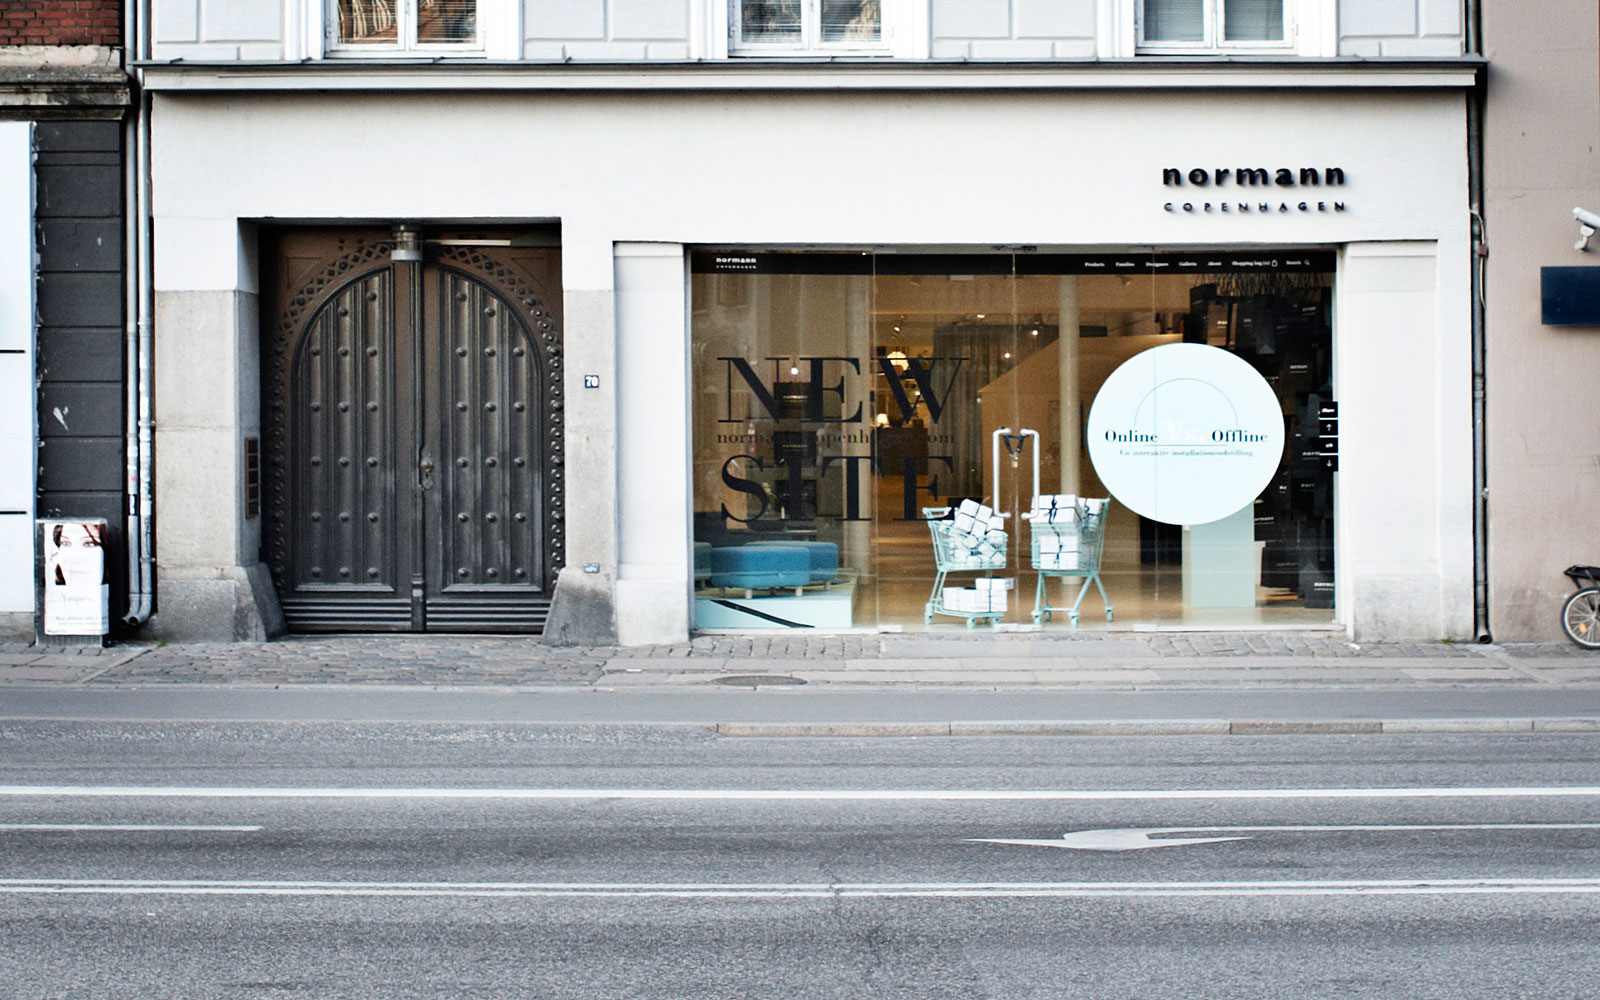 Online vs offline for Normann copenhagen shop